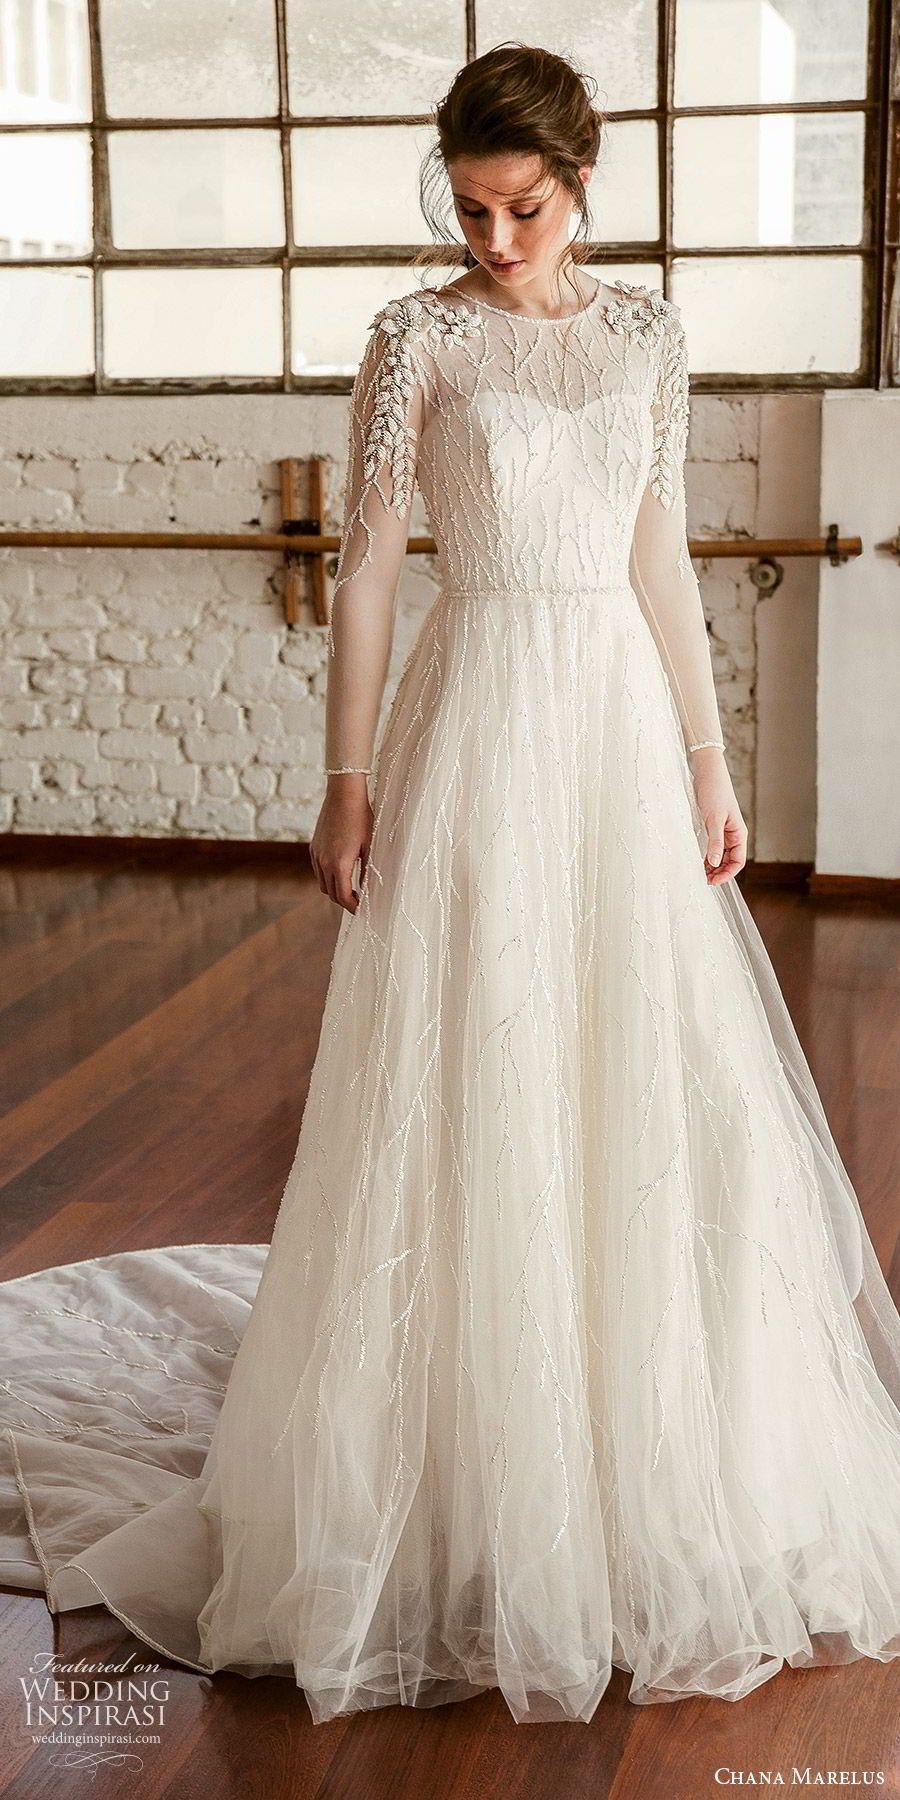 Chana Marelus Fall/Winter 2019 Wedding Dresses | Wedding Inspirasi